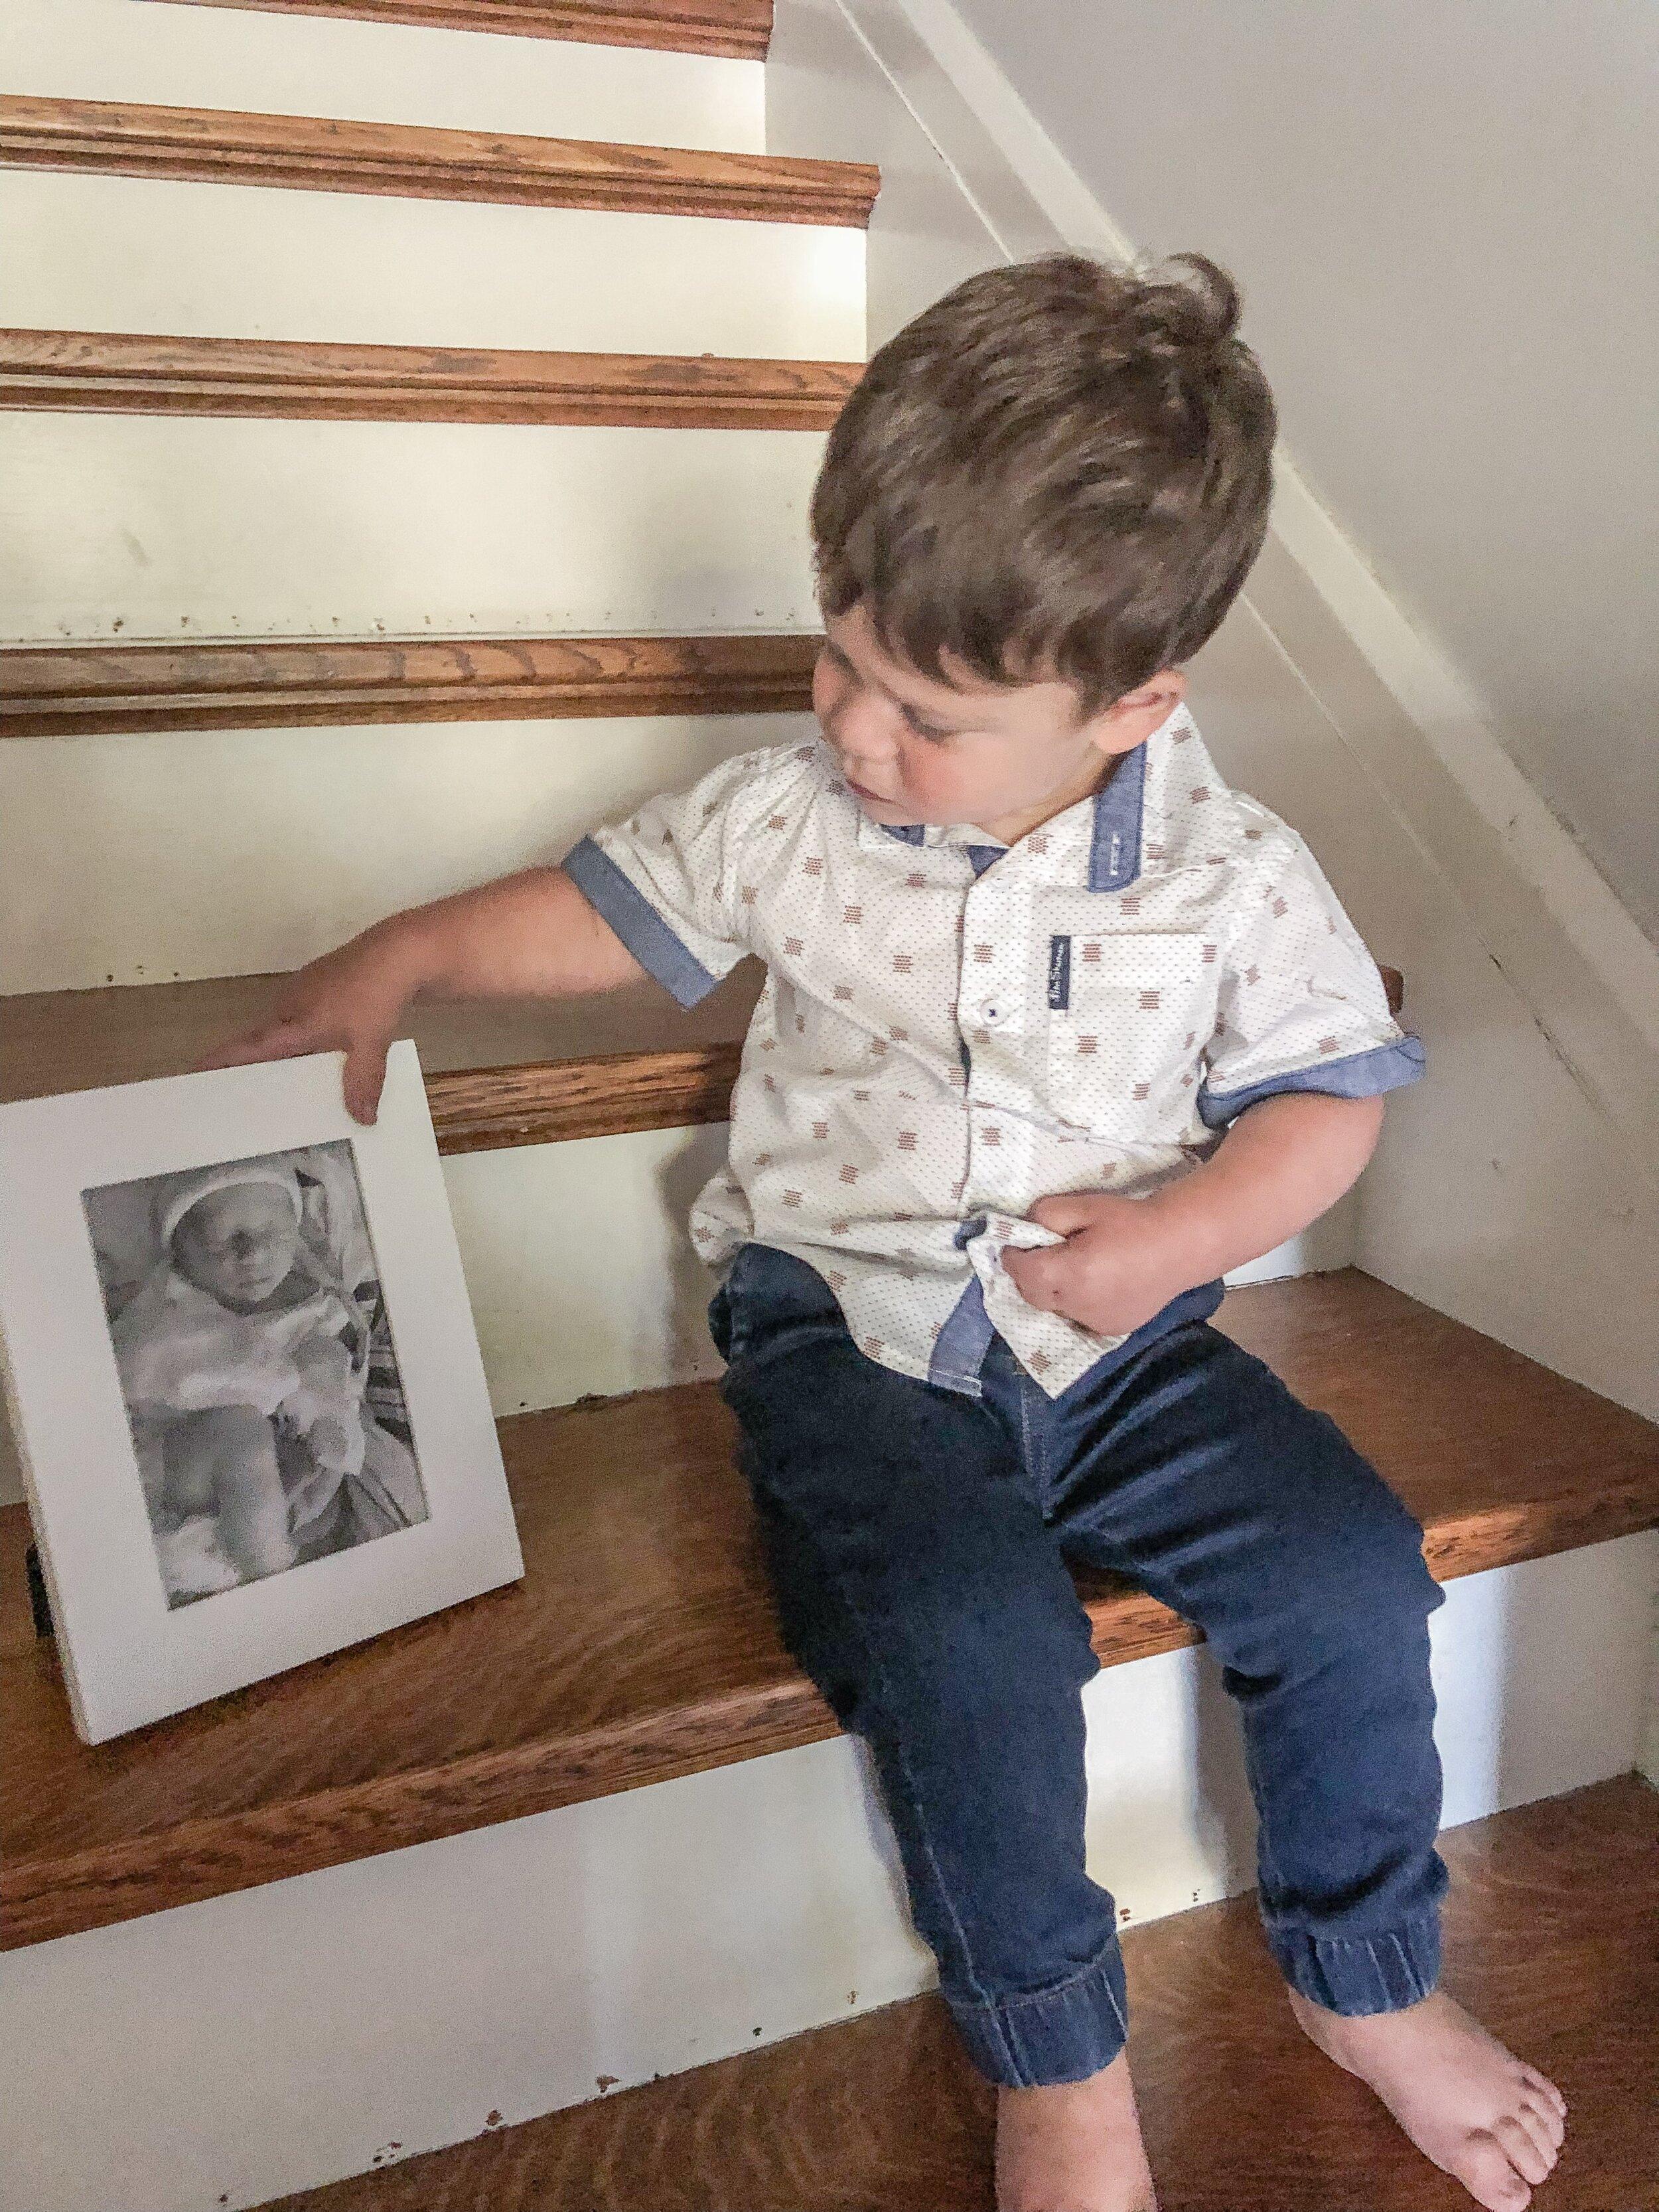 Looking at his newborn photo